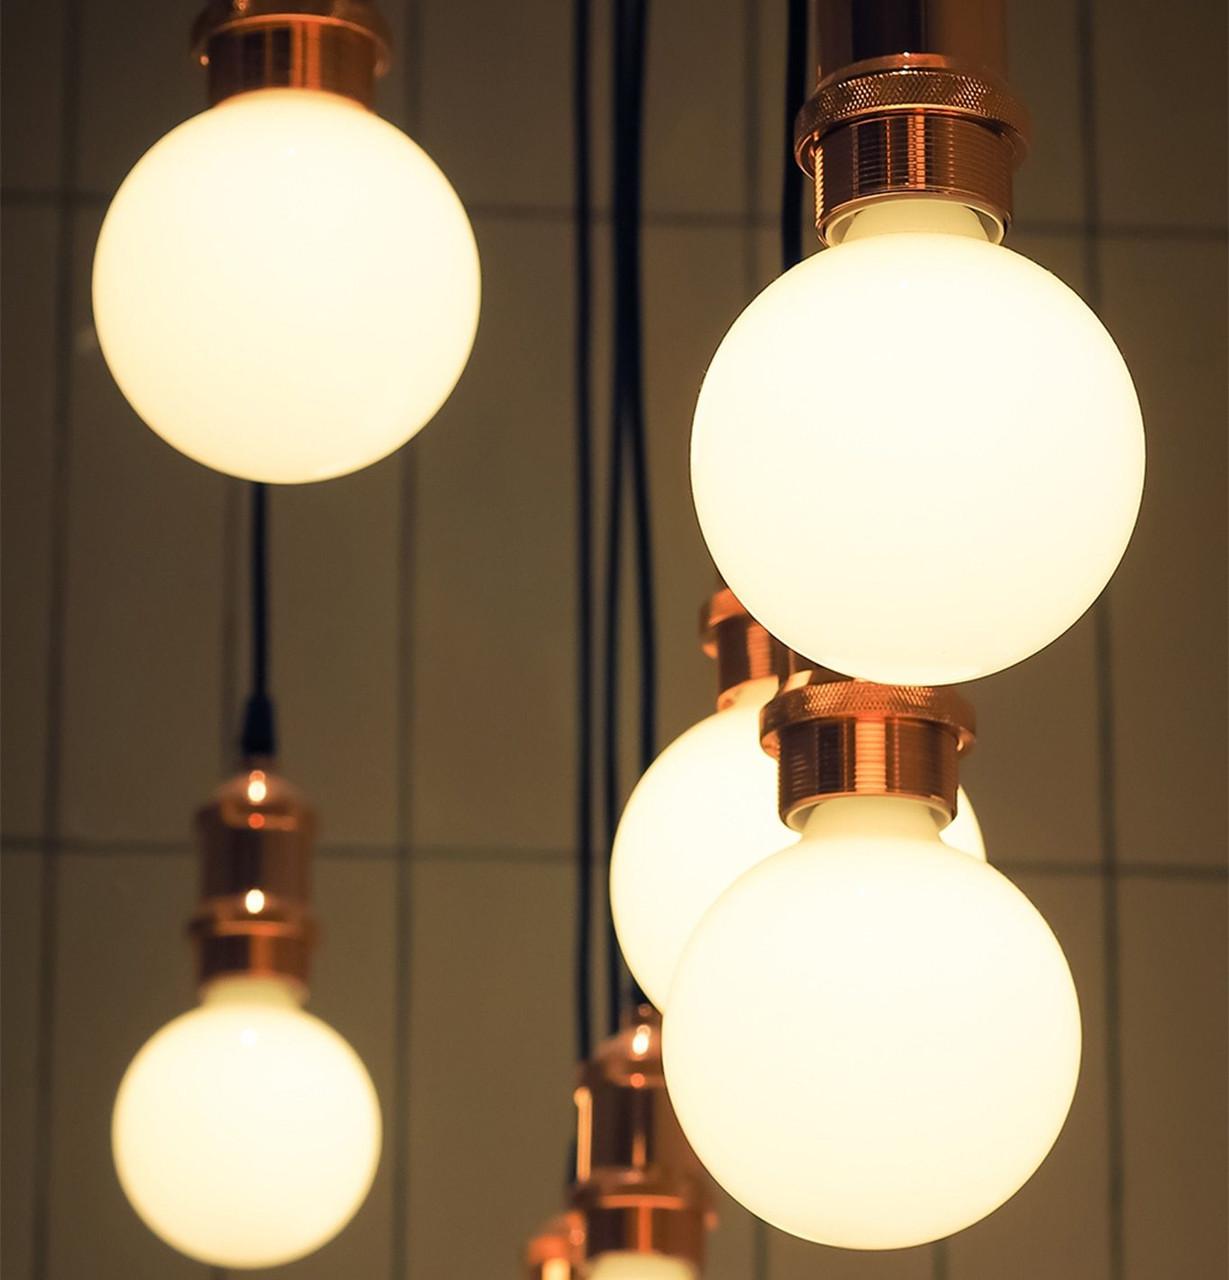 LED G125 BC-B22d Light Bulbs